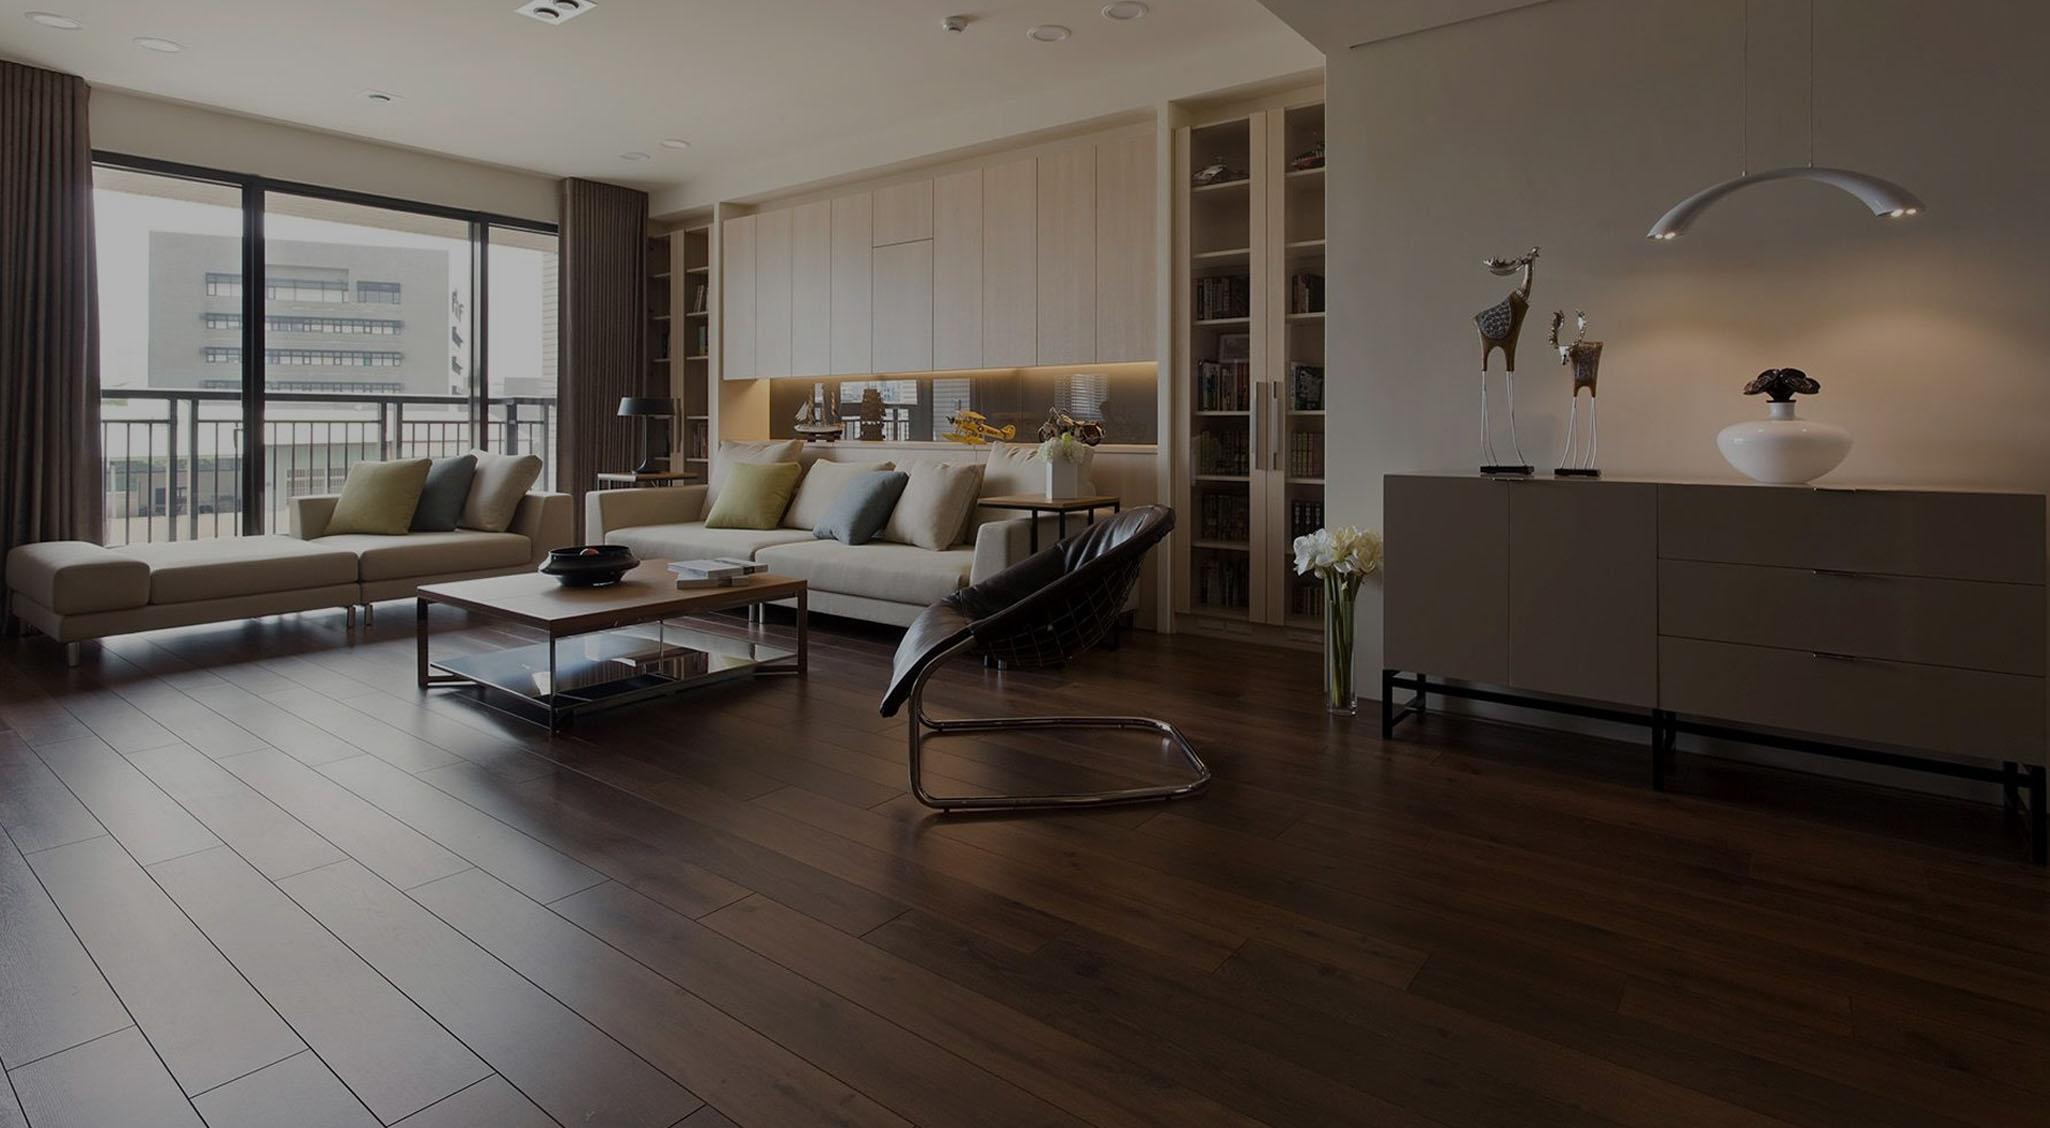 designbelag parkett laminat teppichboden in garbsen. Black Bedroom Furniture Sets. Home Design Ideas